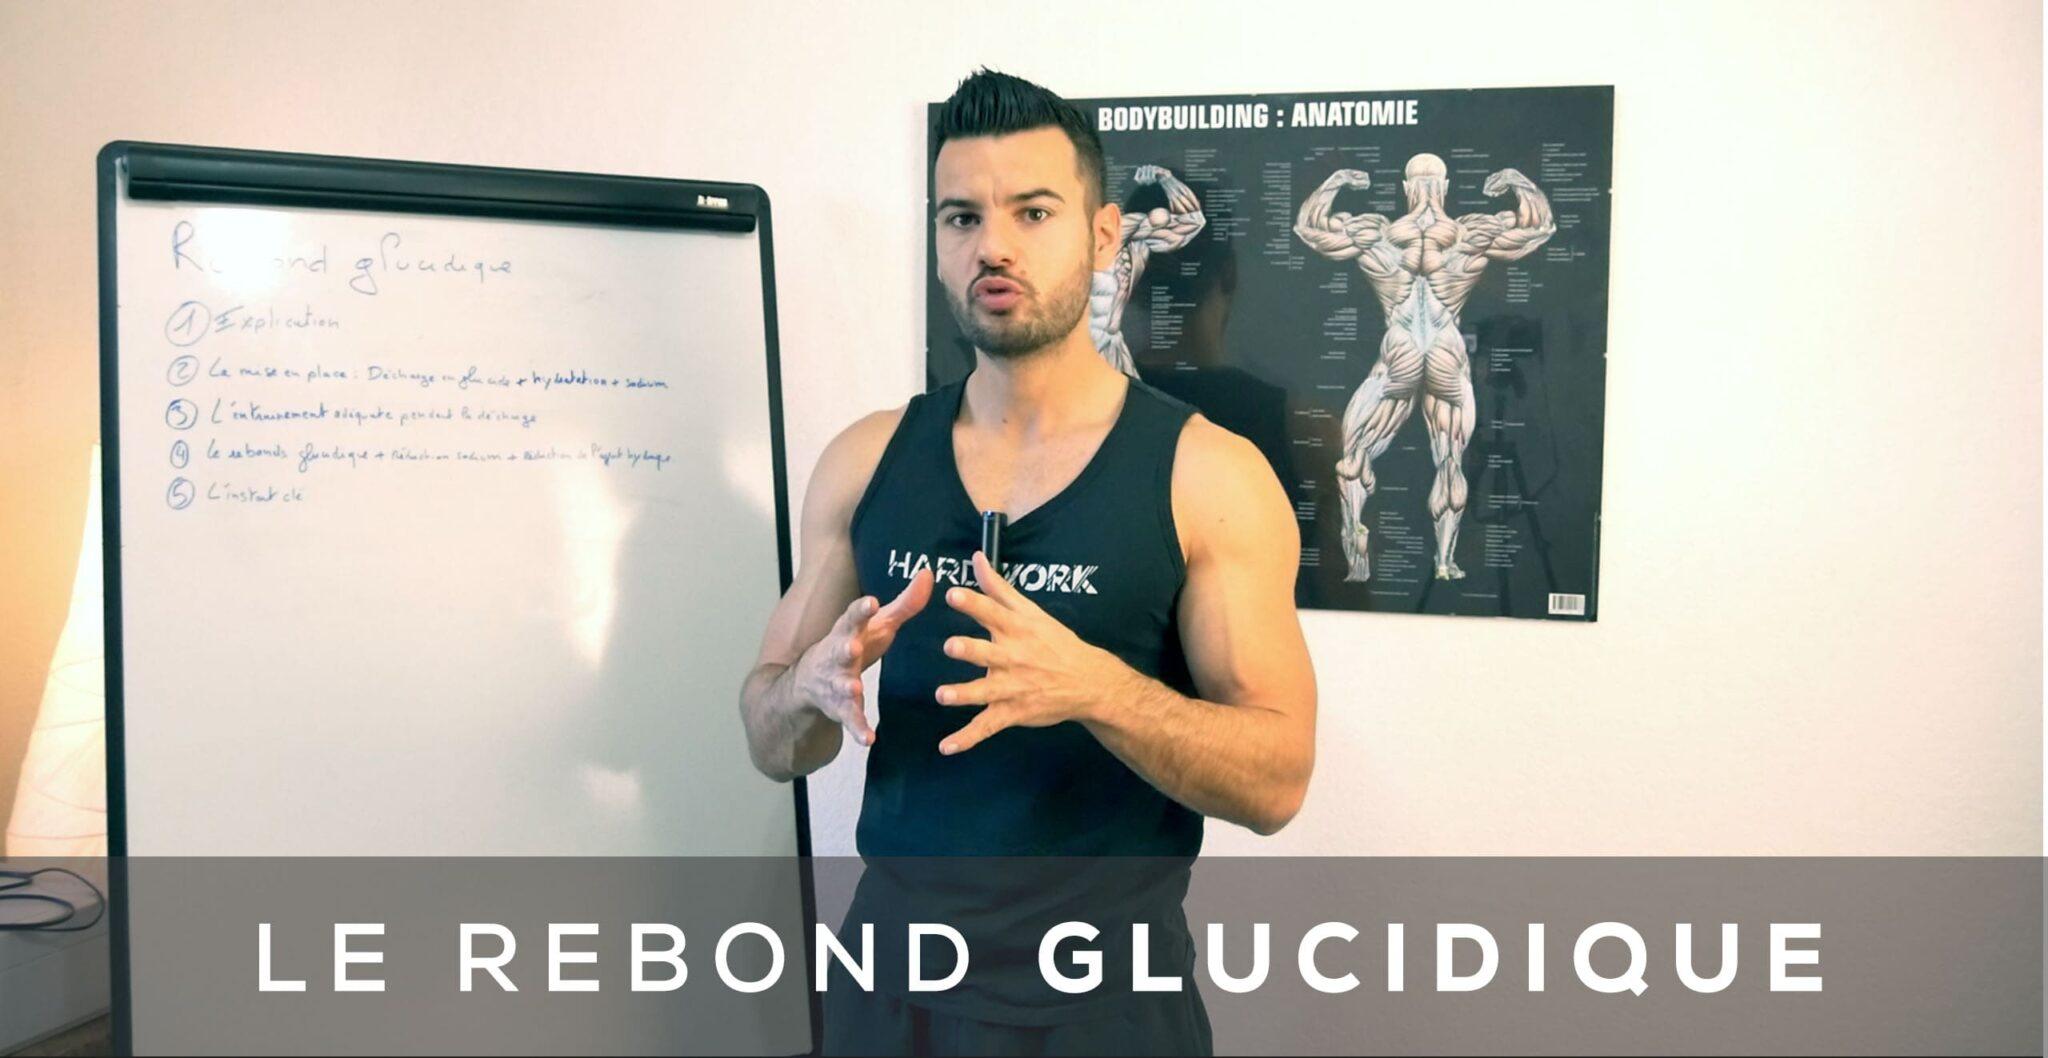 rebond glucidique musculation